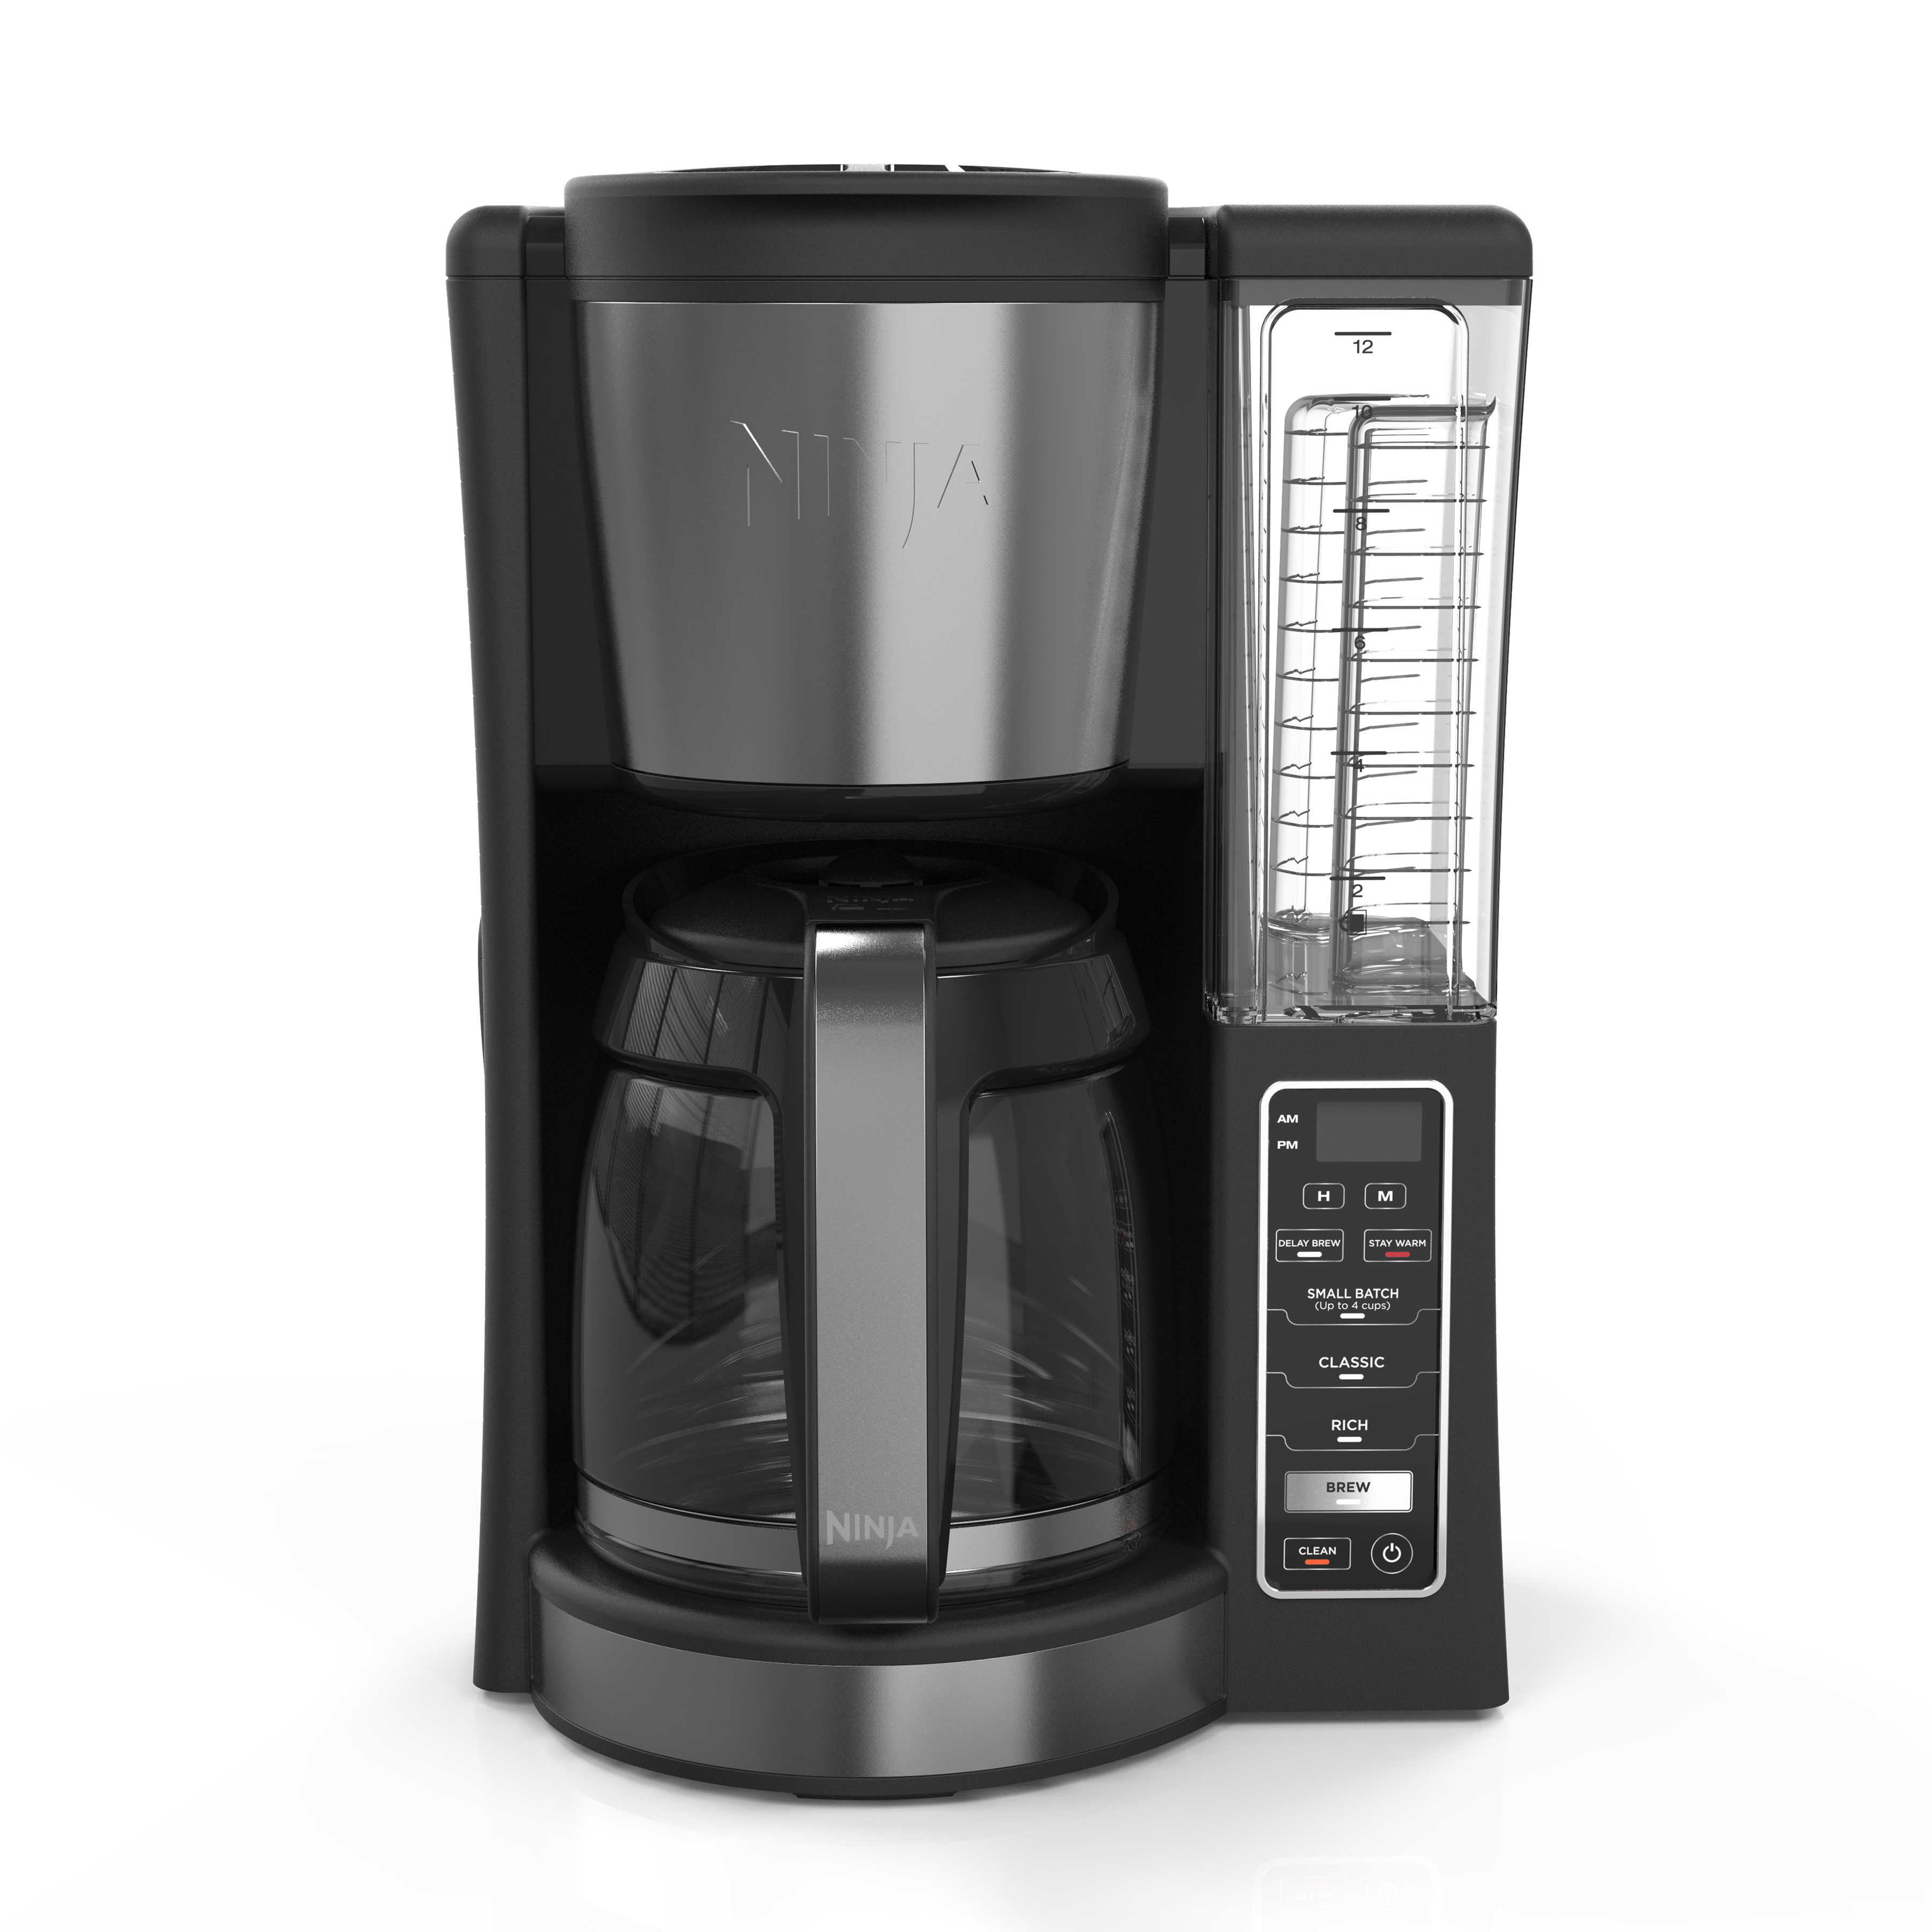 Ninja 12-Cup Programmable Coffee Brewer CE200